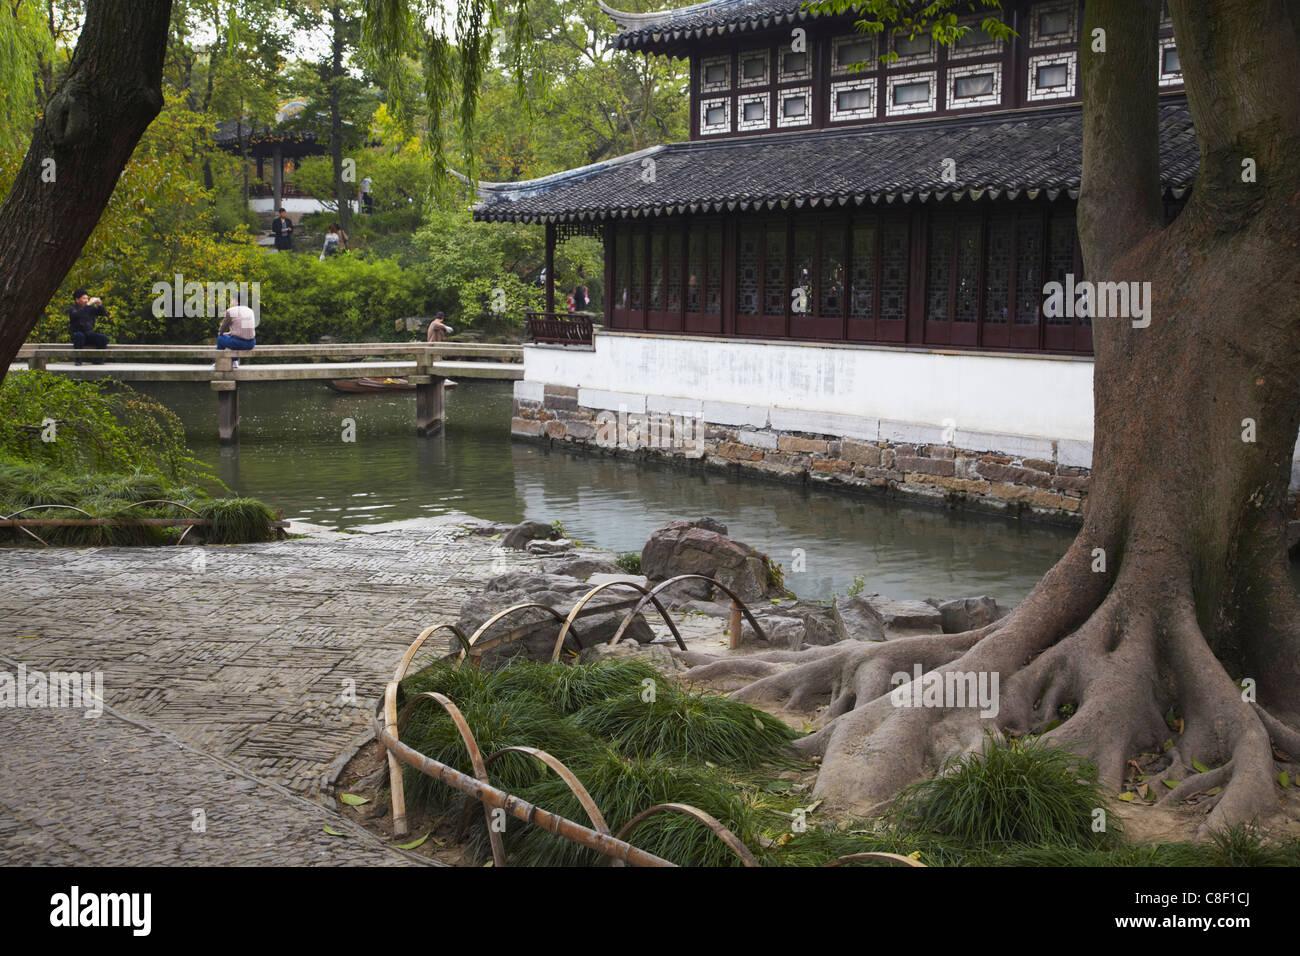 The Humble Administrator's Garden, UNESCO World Heritage Site, Suzhou, Jiangsu, China - Stock Image